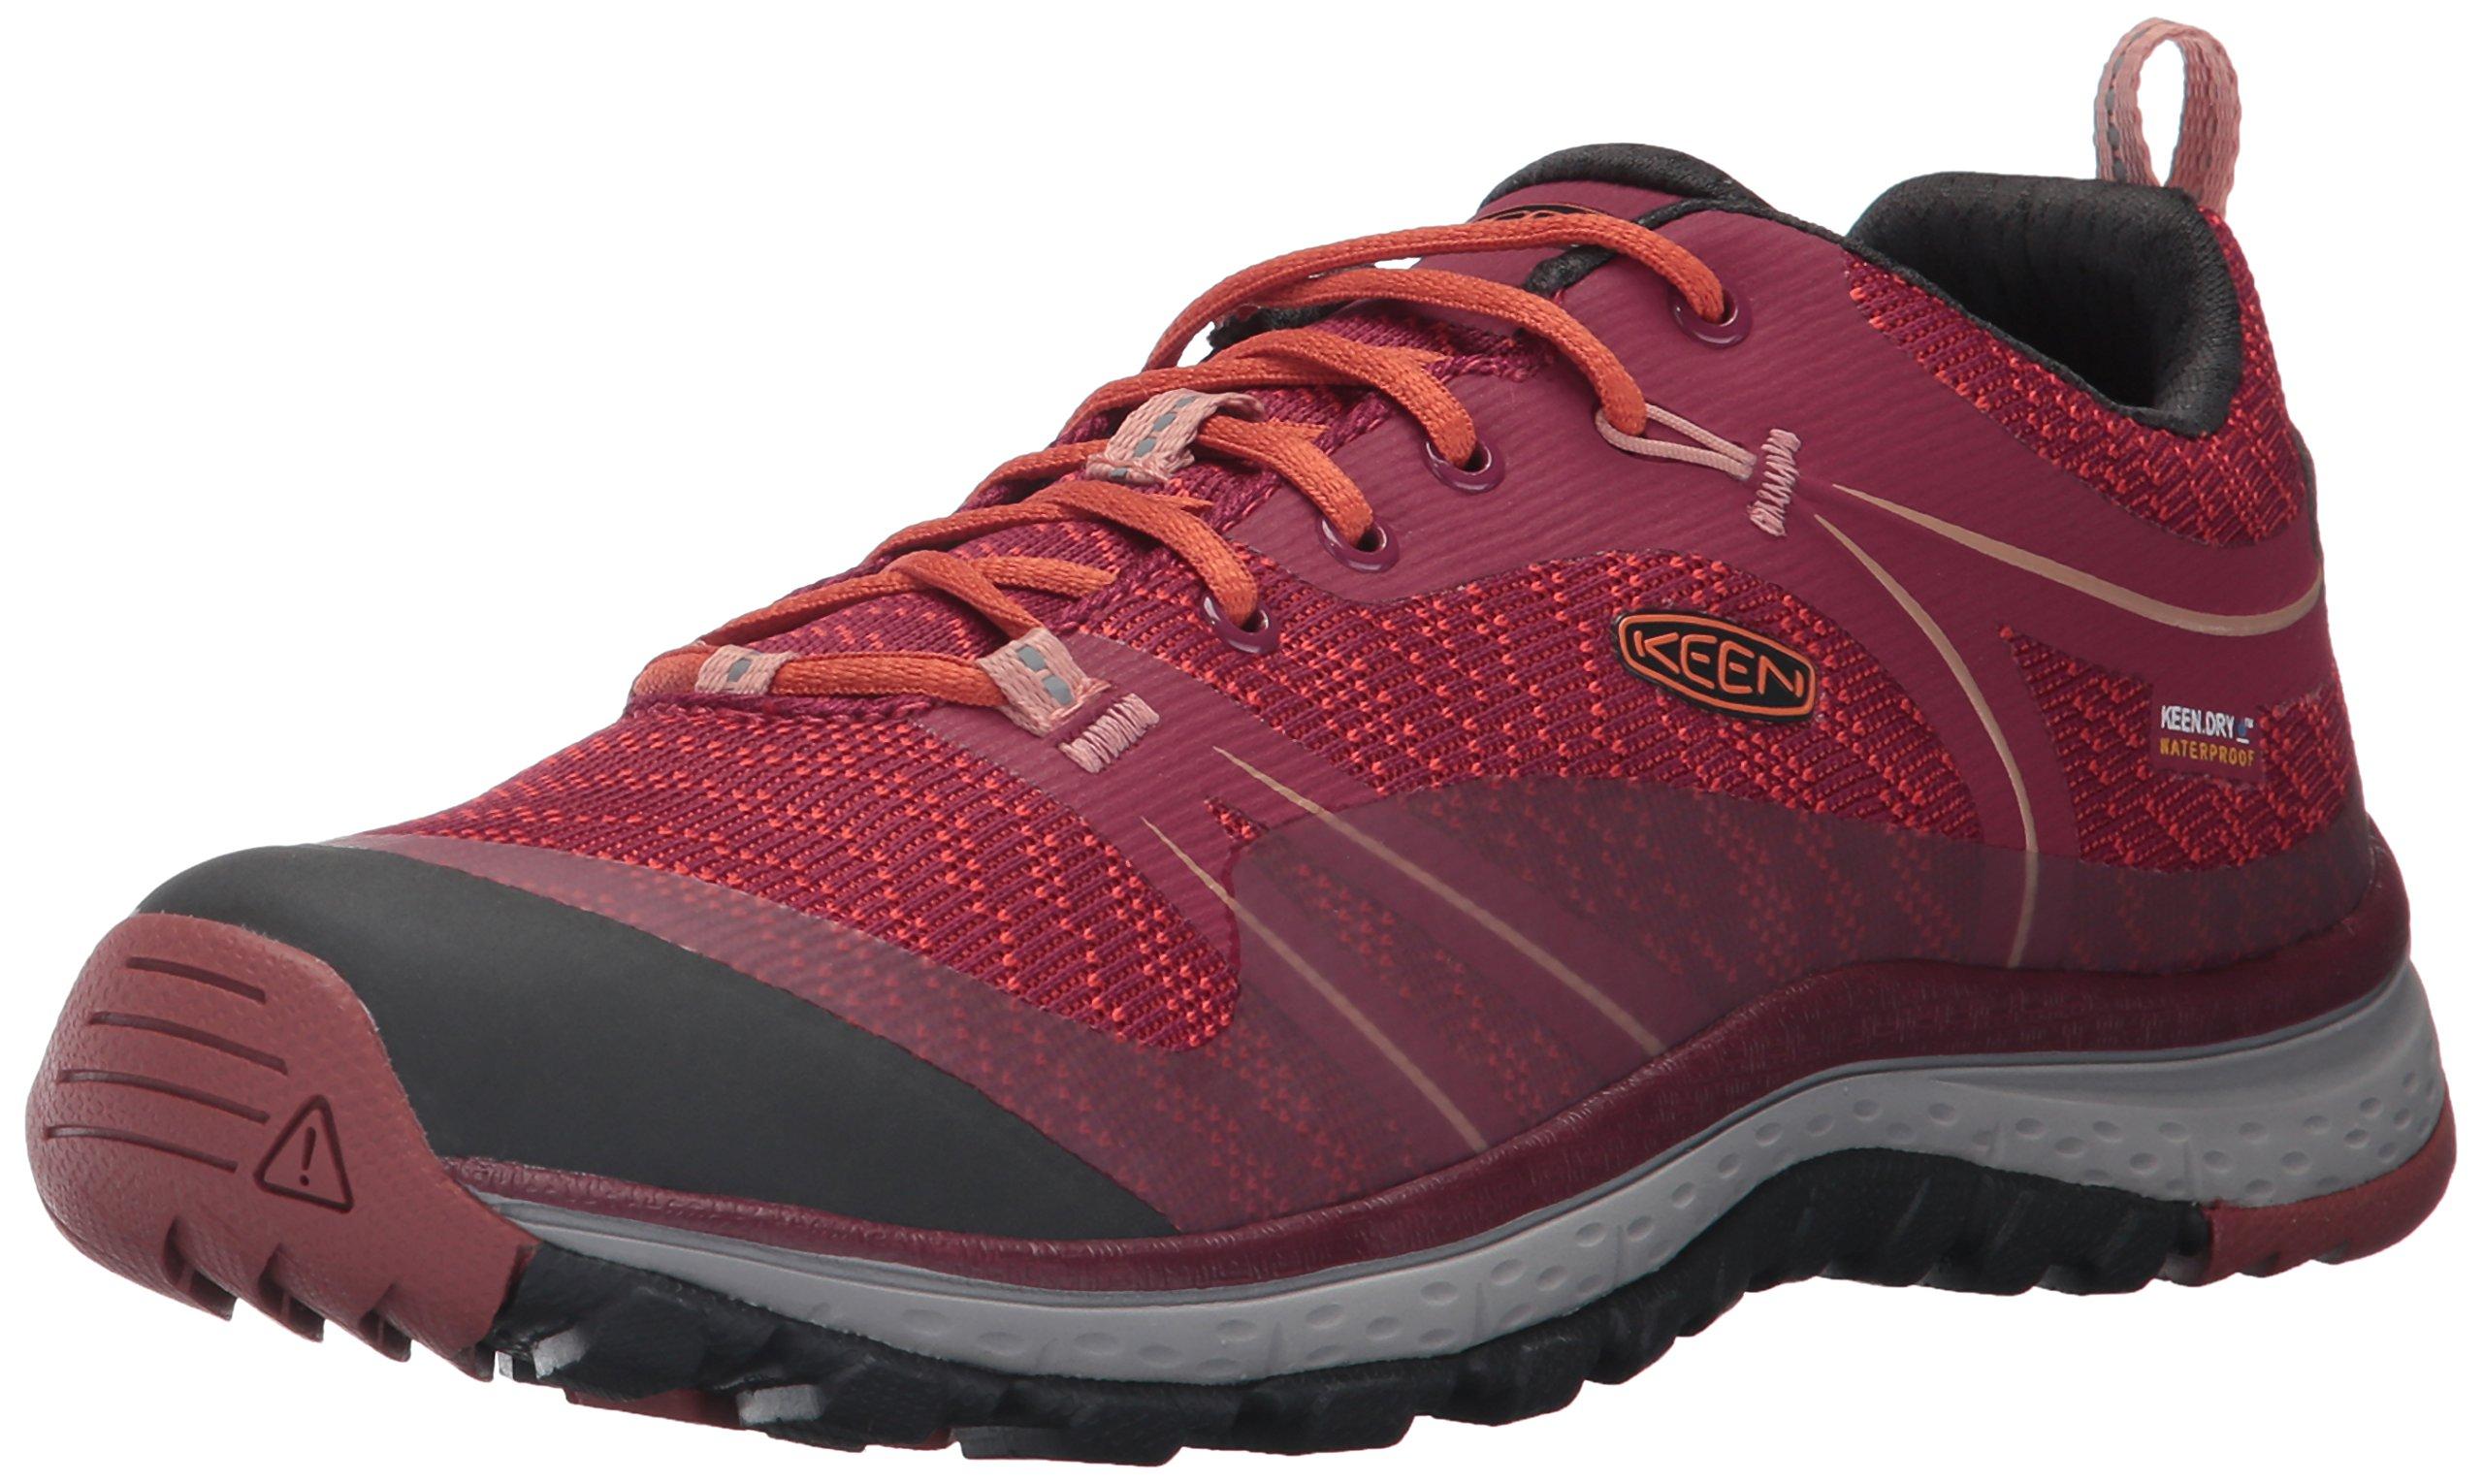 KEEN Women's Terradora Wp-w Trail Runner,Rhododendron/Marsala,11 M US